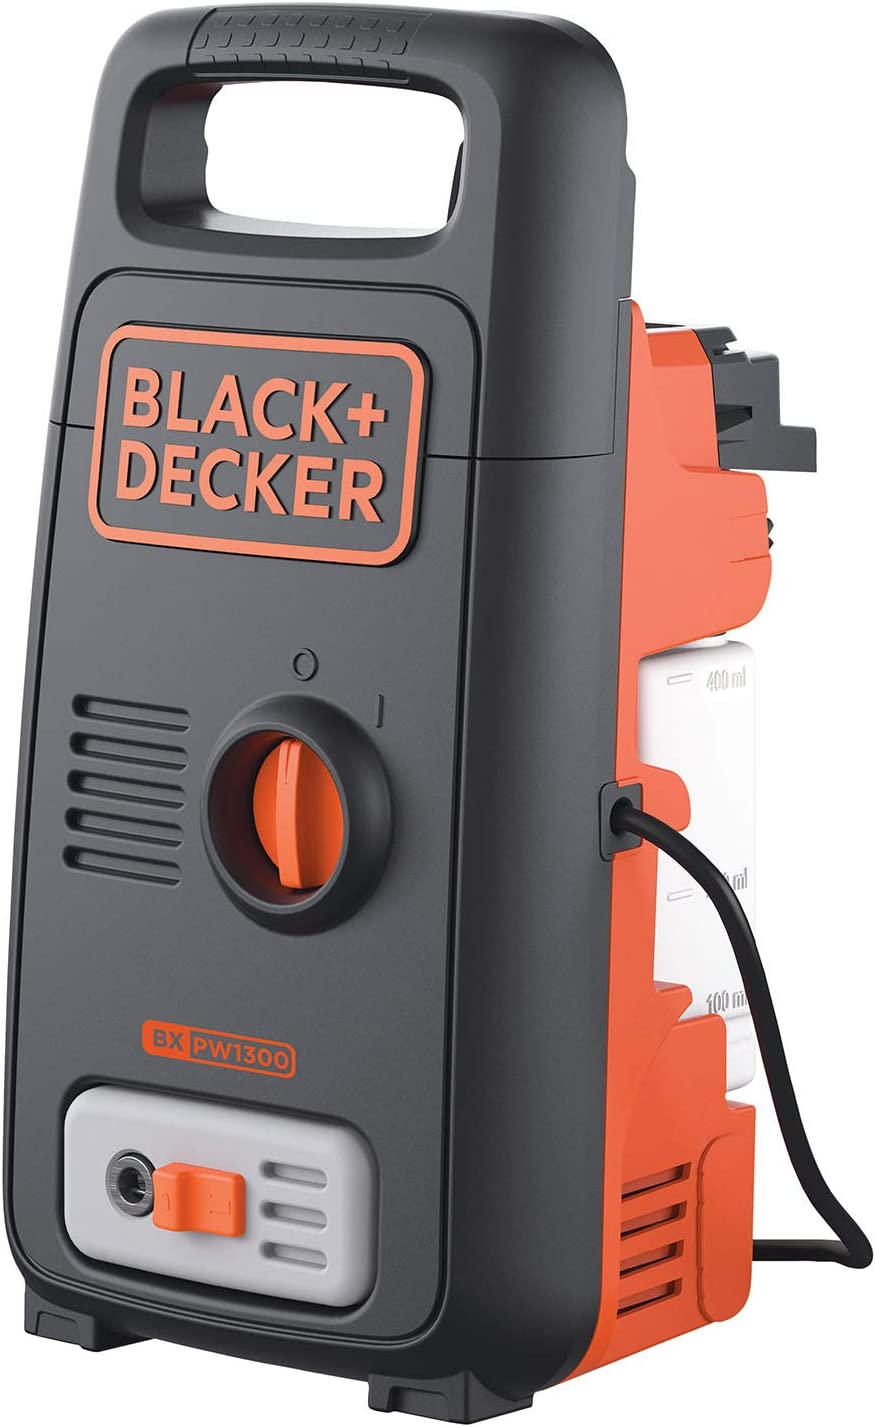 بلاك اند ديكر مضخة ماء ذات ضغط عالي ، 1300 واط ، ضغط 100 بار ، BXPW1300E-B5